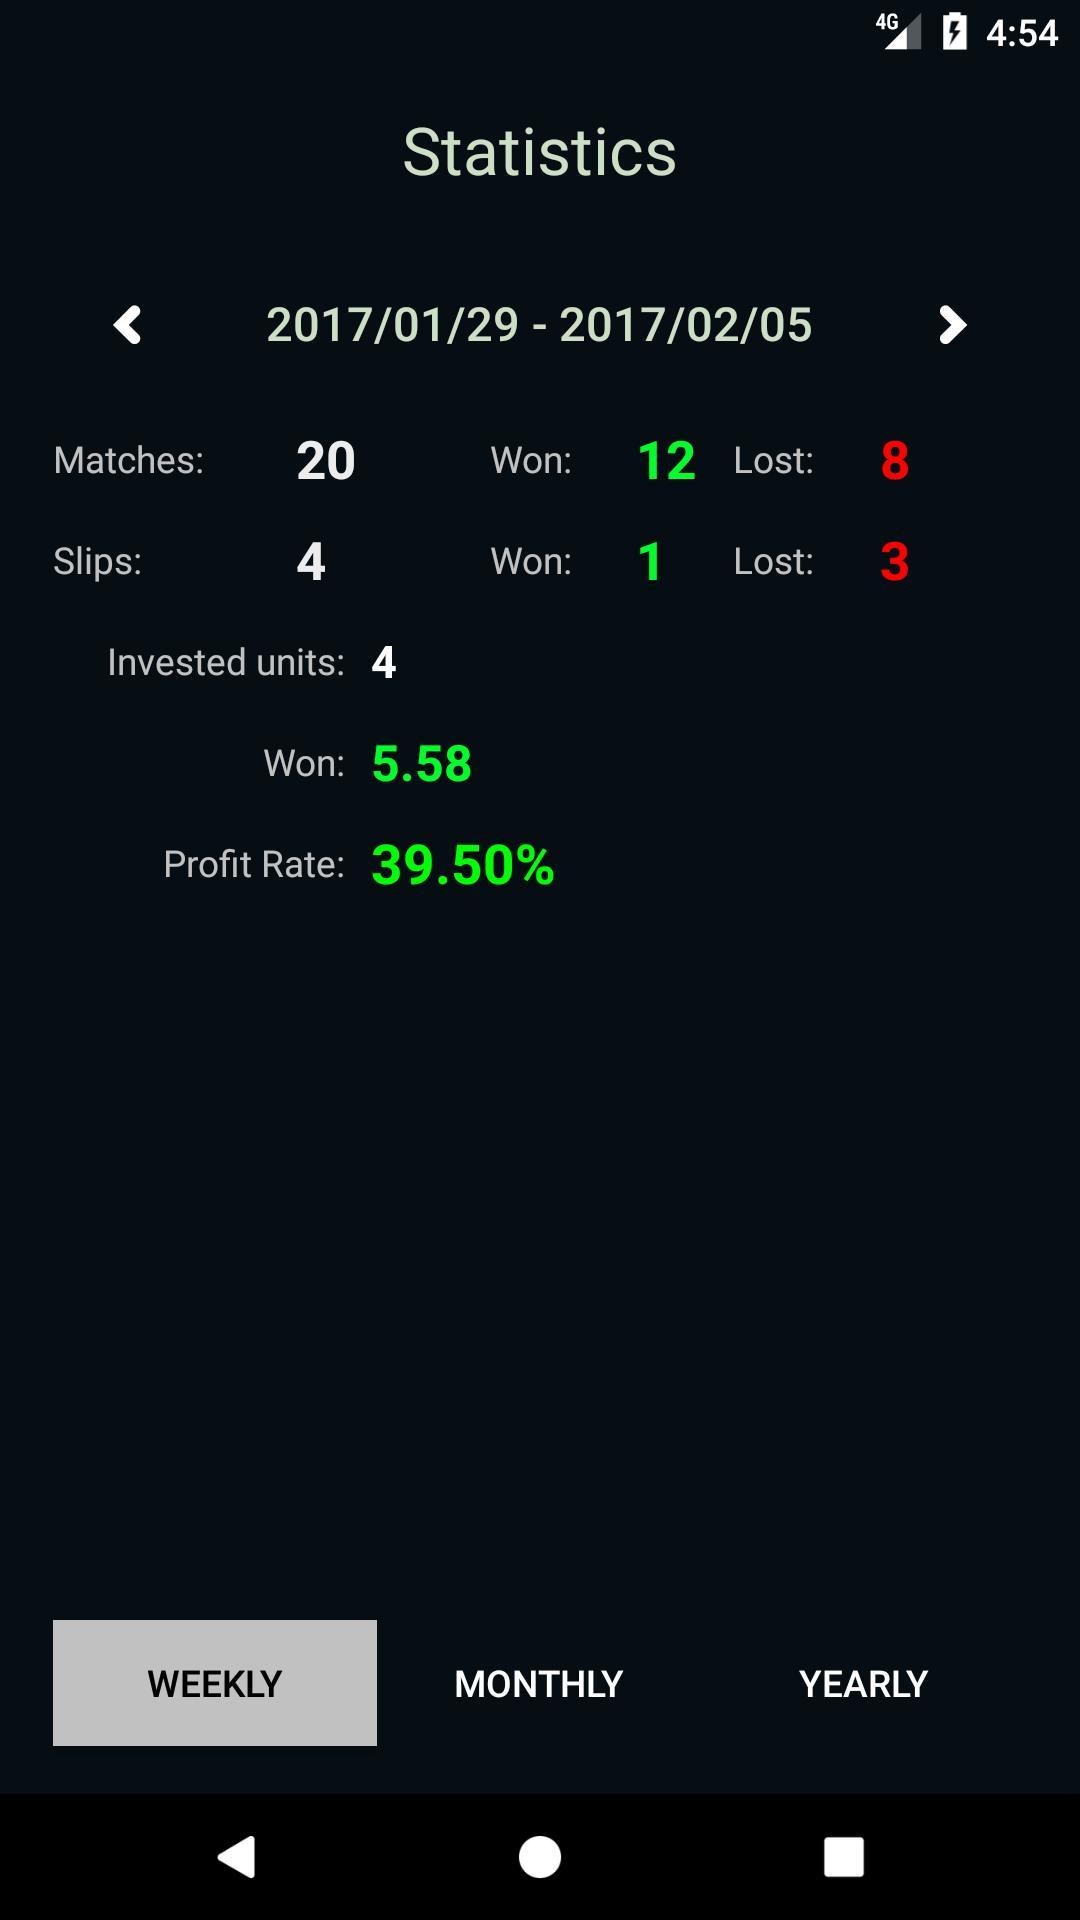 Nhl betting tips 1x2 odds tnt inside the nba underdog betting